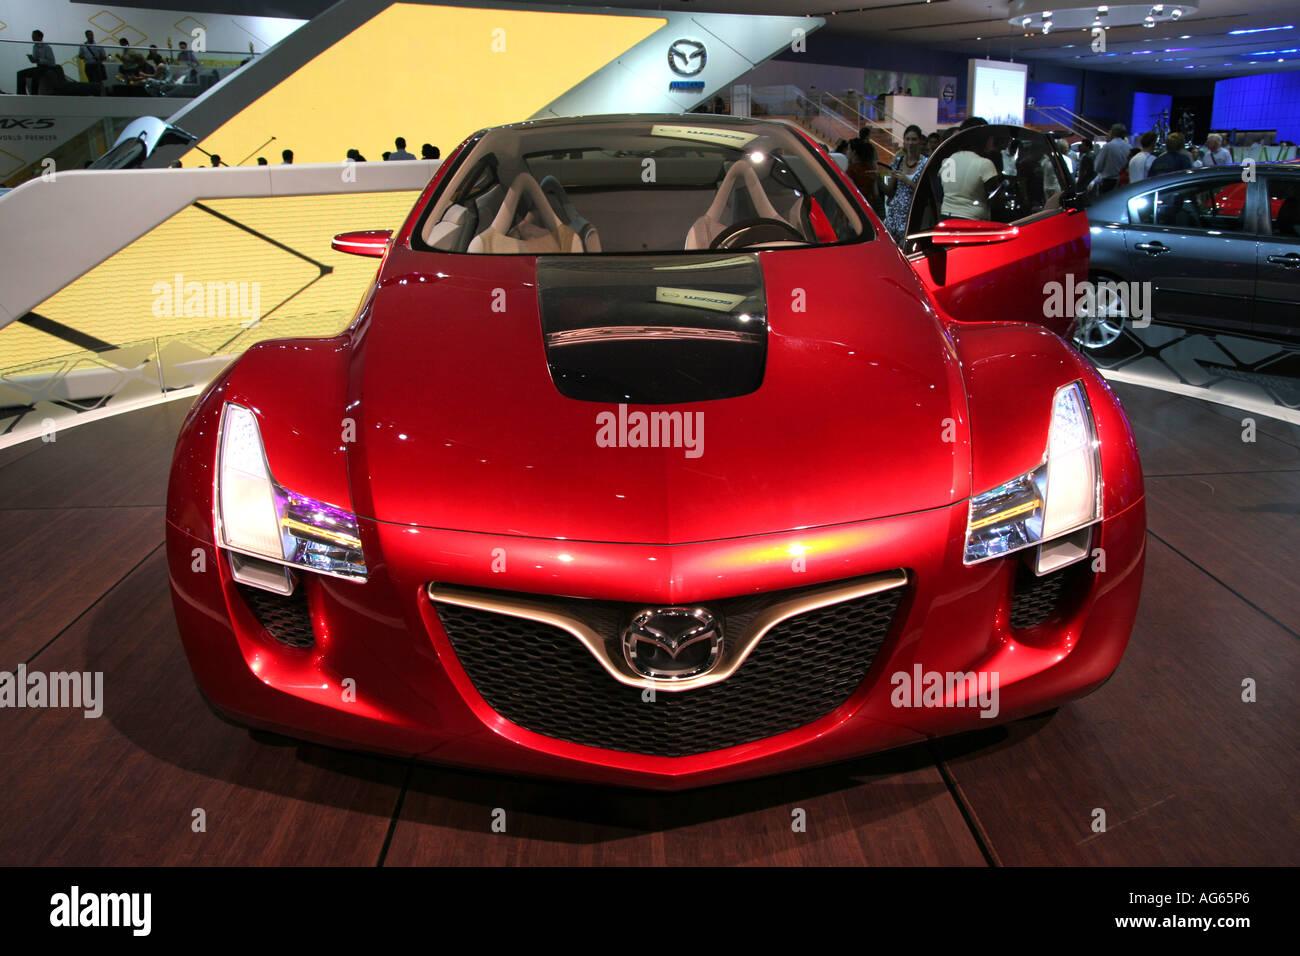 https://c8.alamy.com/comp/AG65P6/mazda-kabura-at-the-2006-british-international-motor-show-at-london-AG65P6.jpg